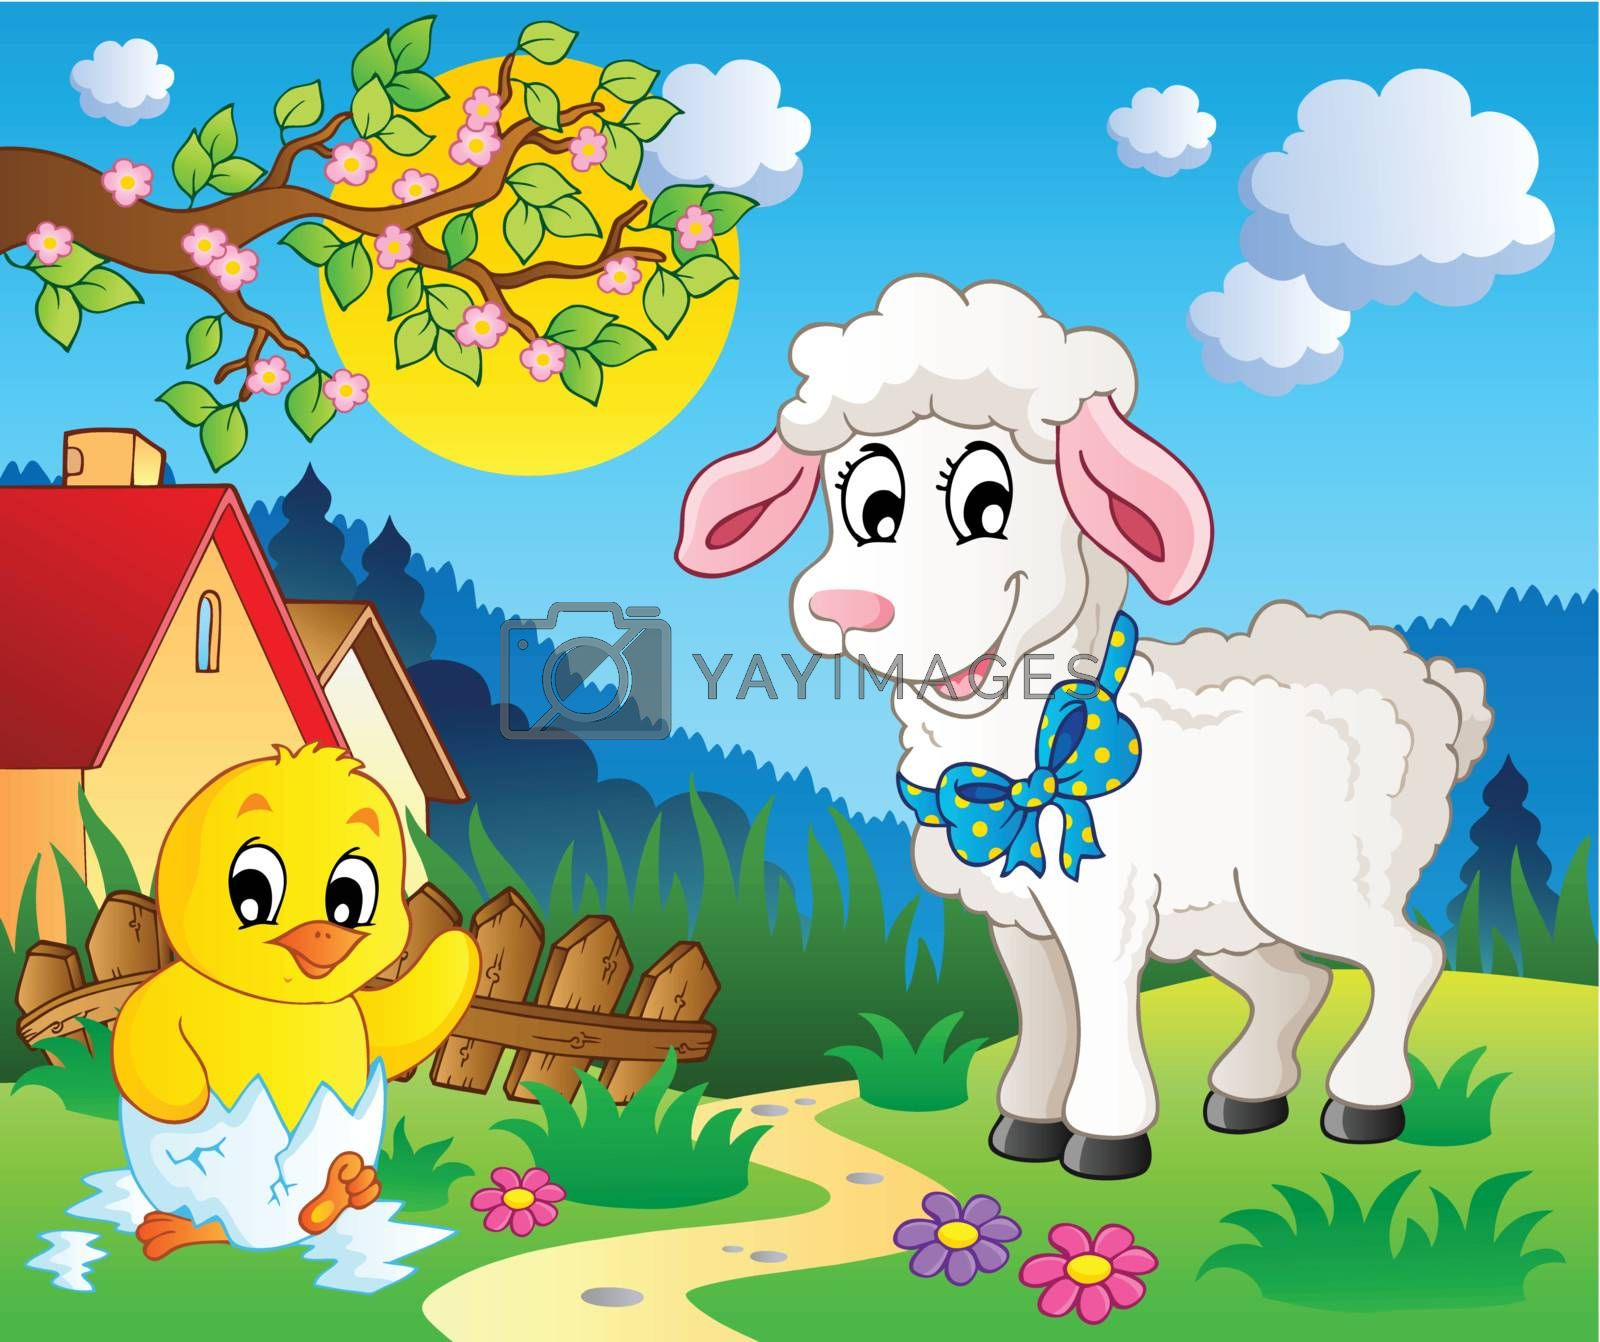 Scene with spring season theme 3 - vector illustration.